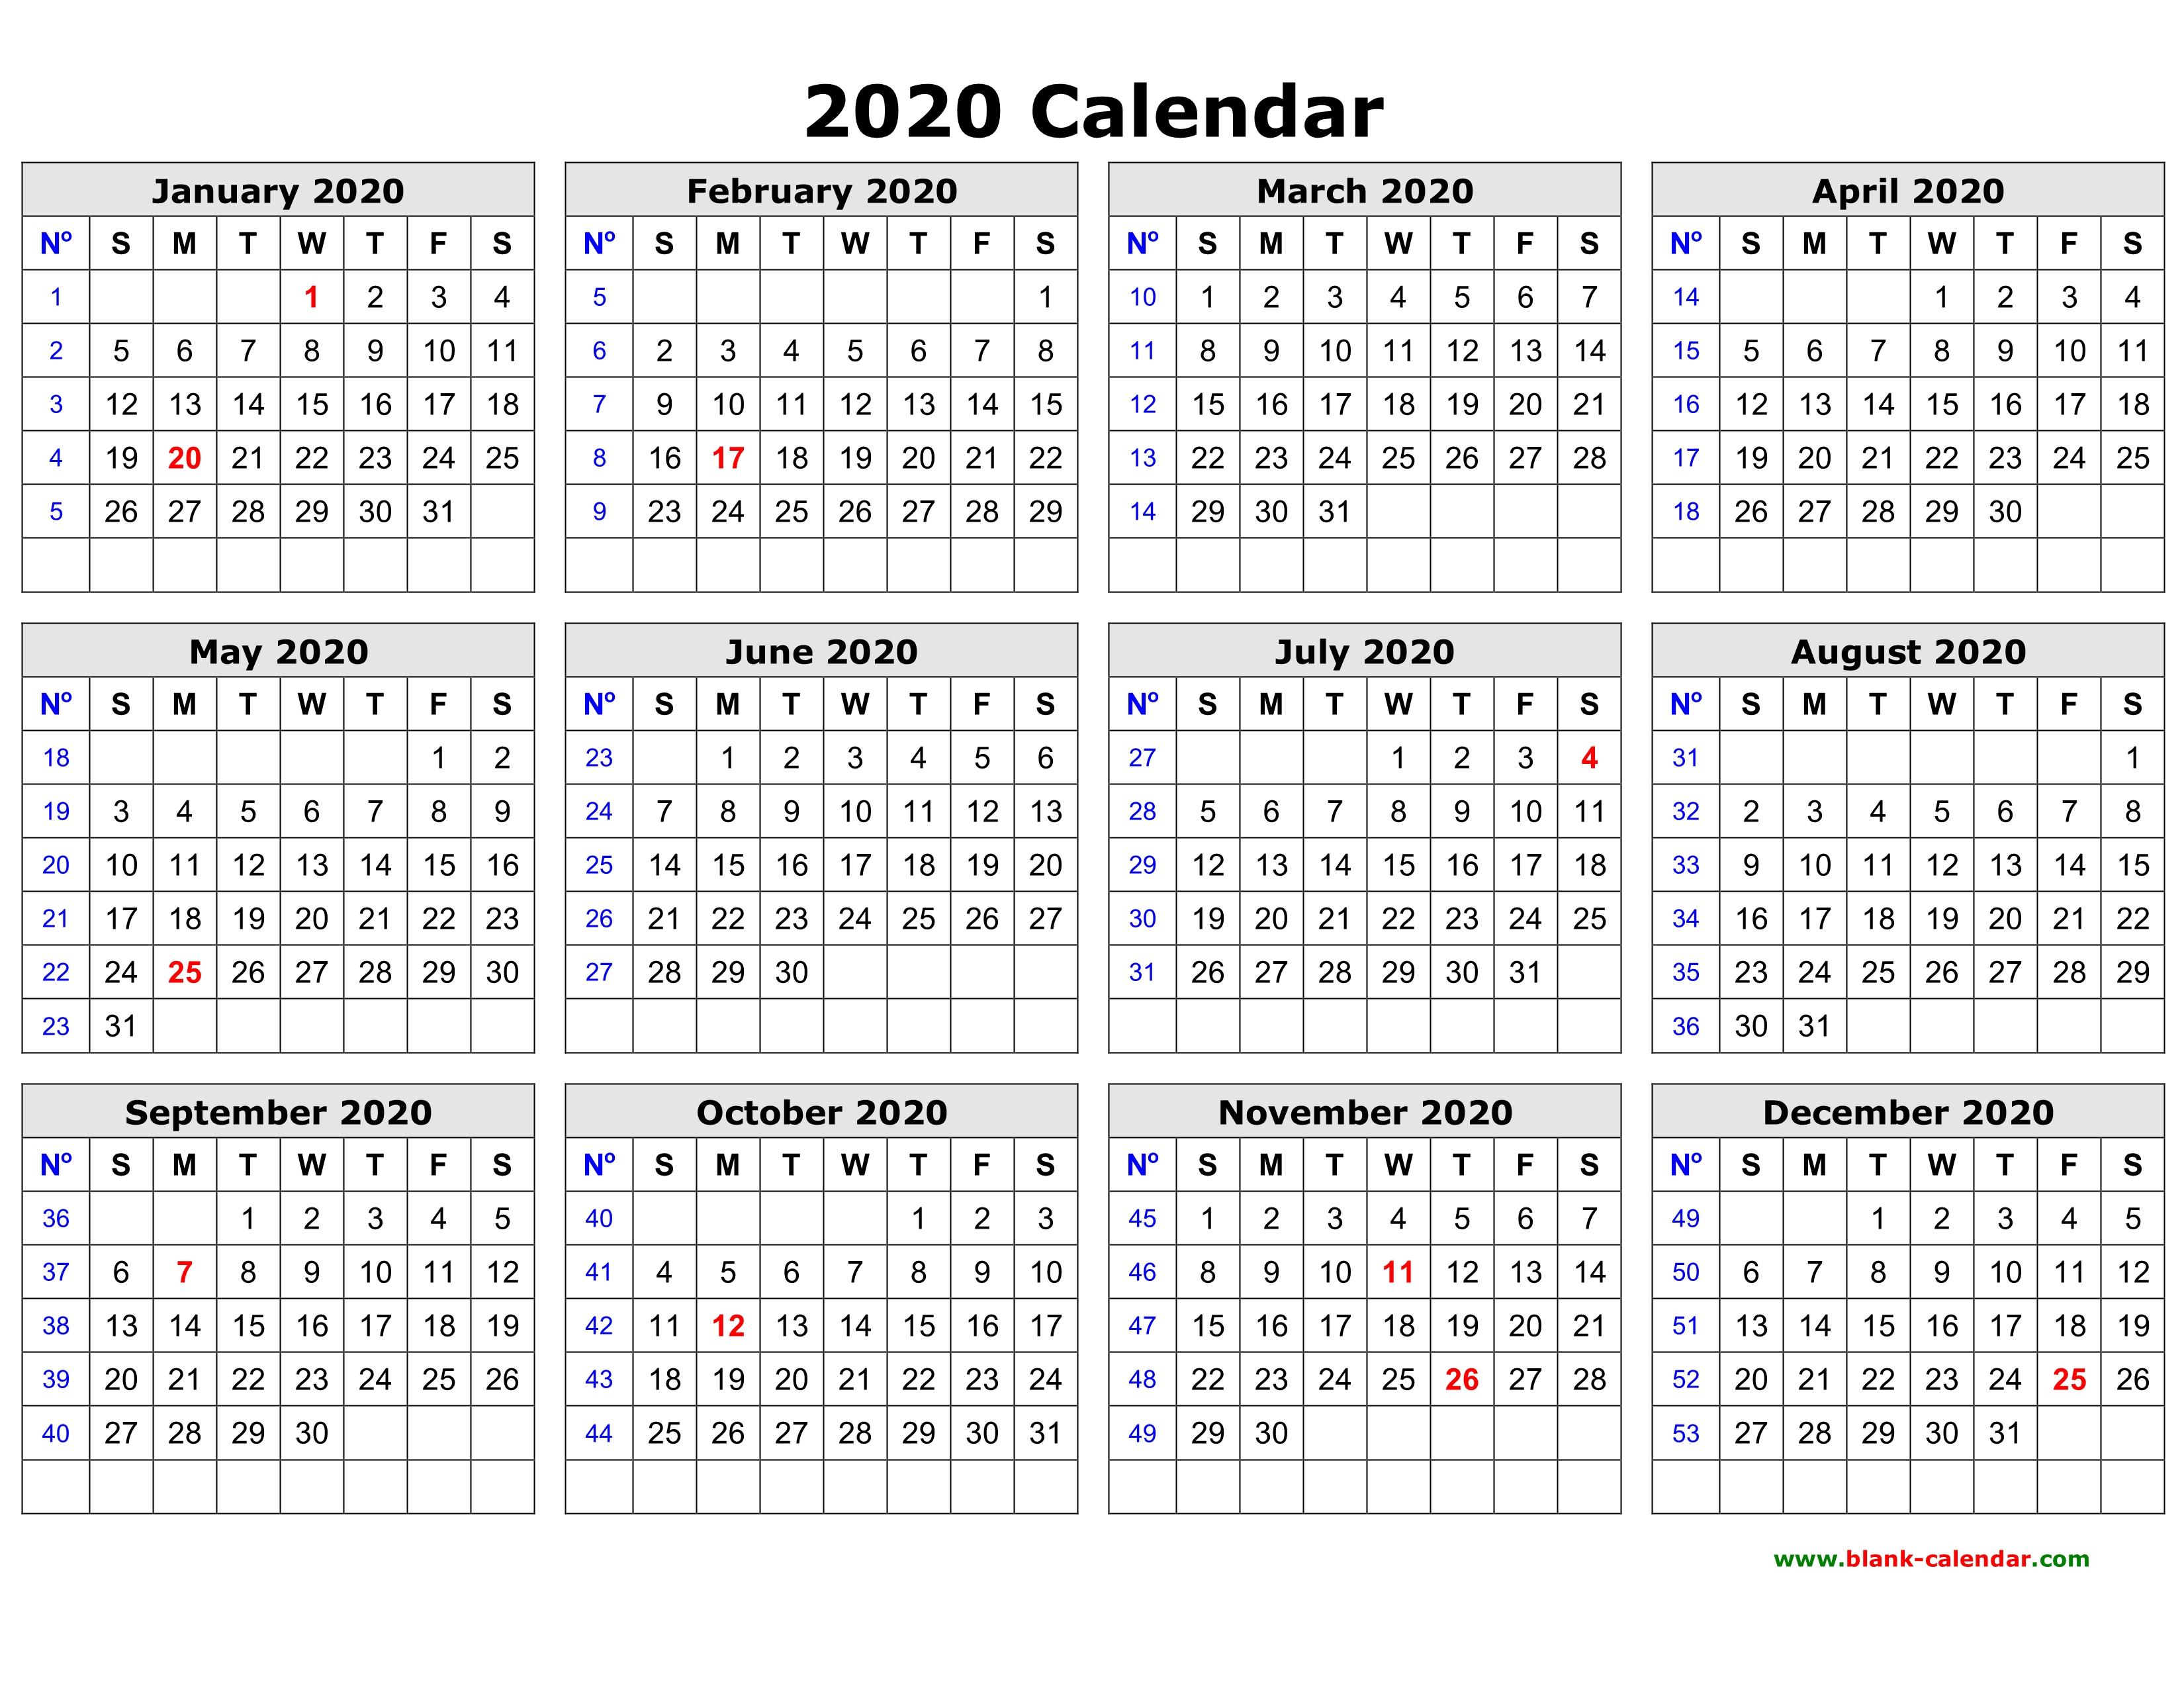 Year 2020 Calendar Printable - Wpa.wpart.co